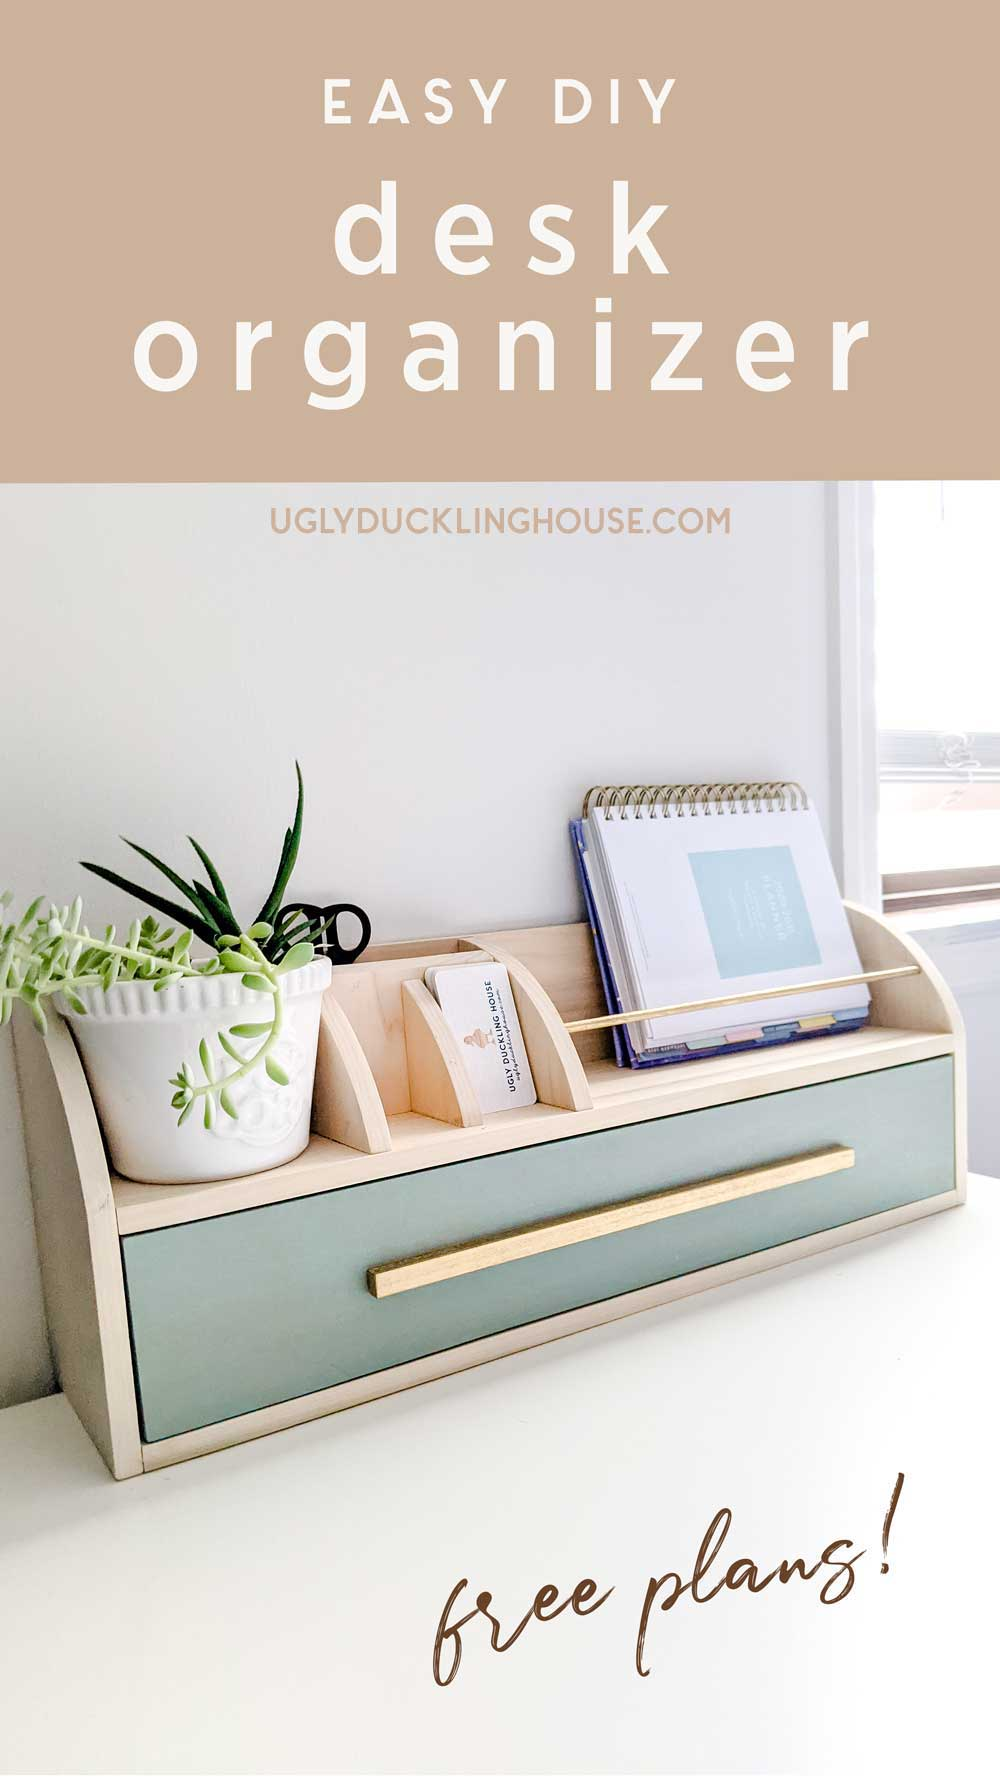 Easy-DIY-desk-organizer-Minwax-Vintage-Blue